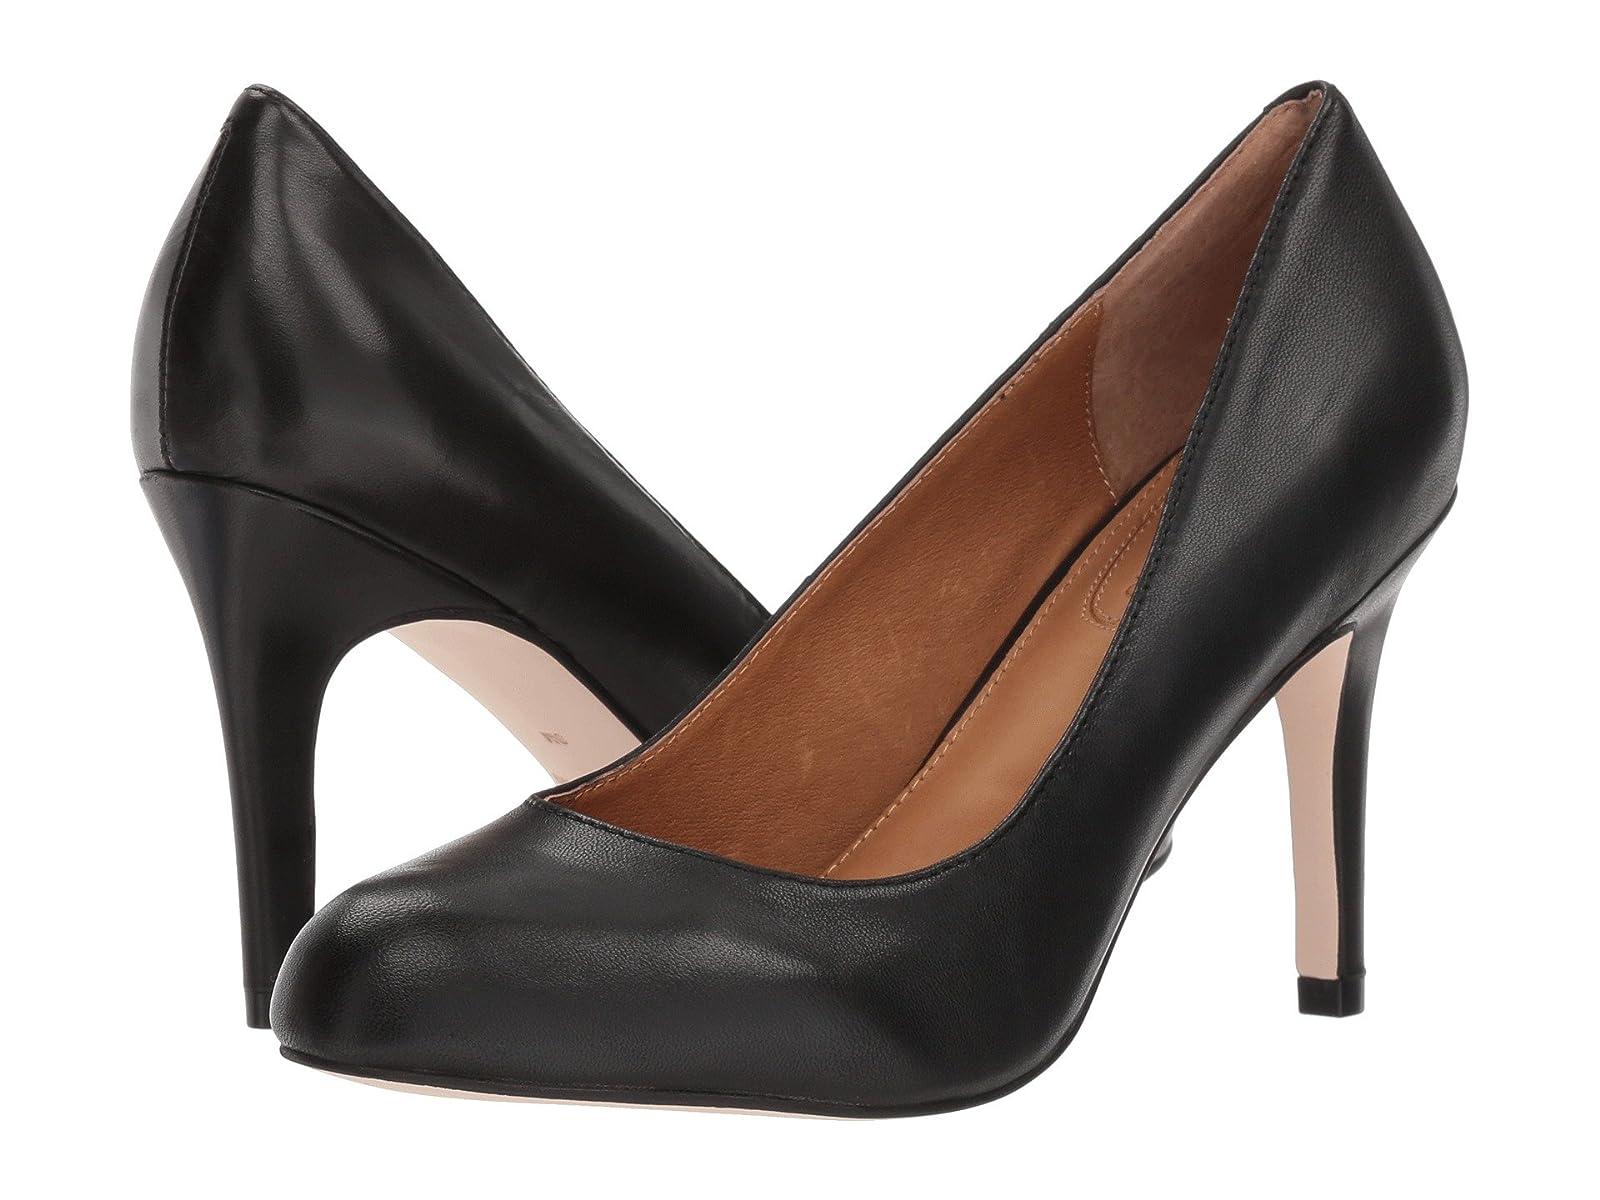 CC Corso Como DelAtmospheric grades have affordable shoes